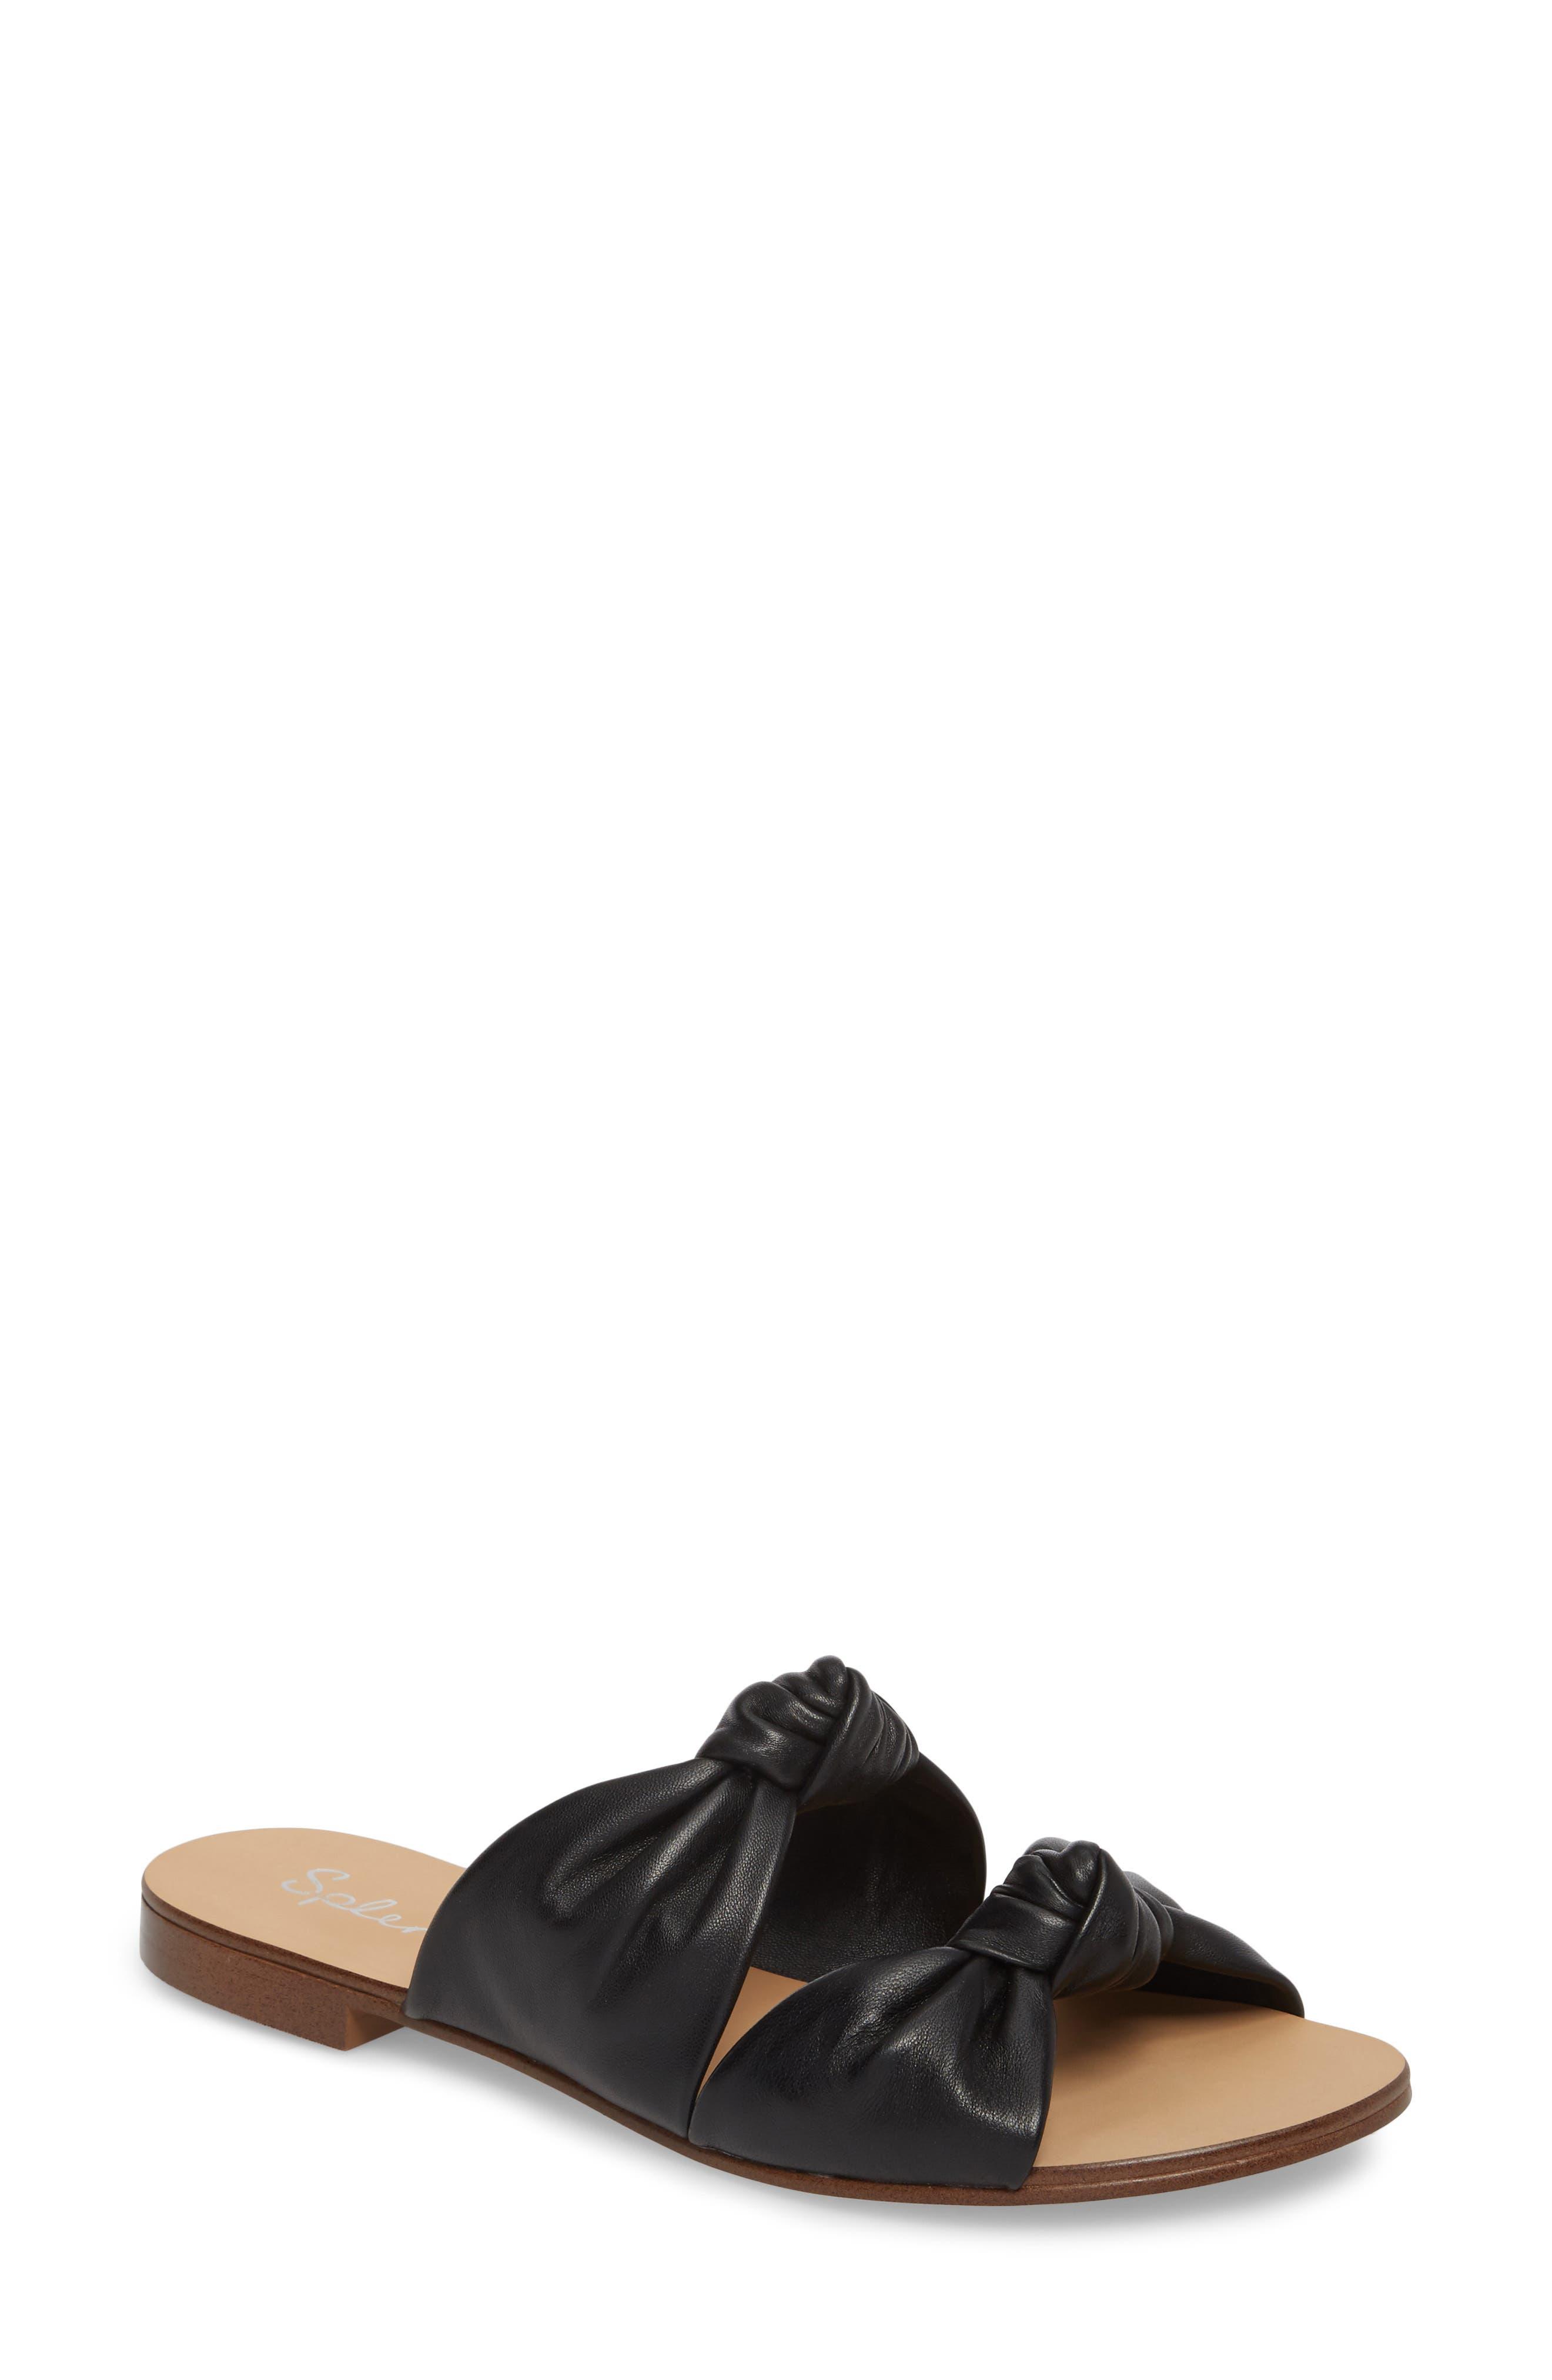 Barton Double Knotted Slide Sandal,                             Main thumbnail 1, color,                             BLACK LEATHER